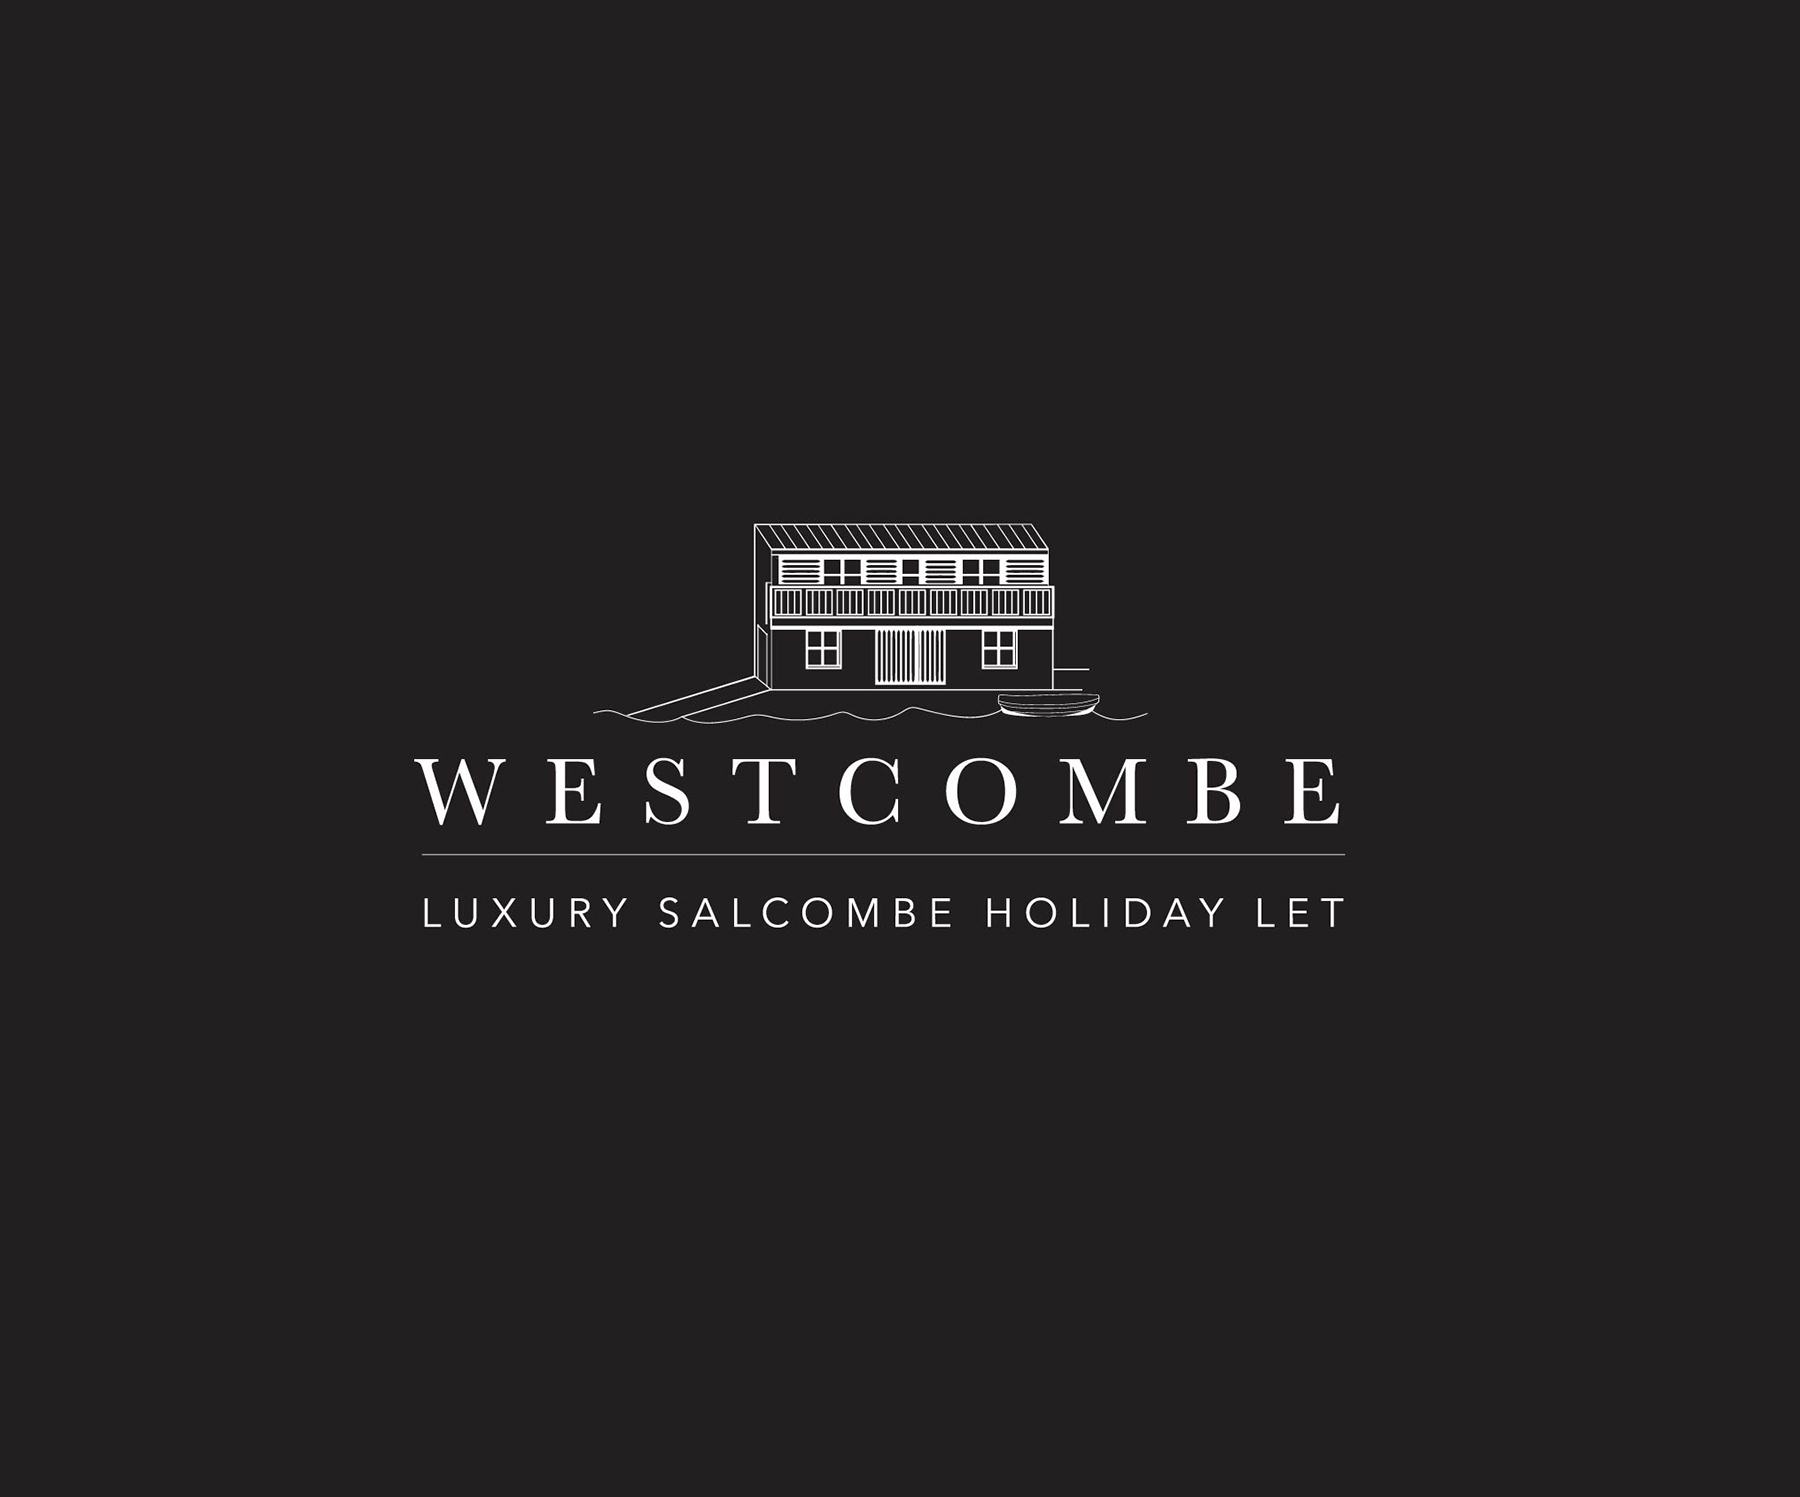 westcombe salcombe logo design by paddle creative